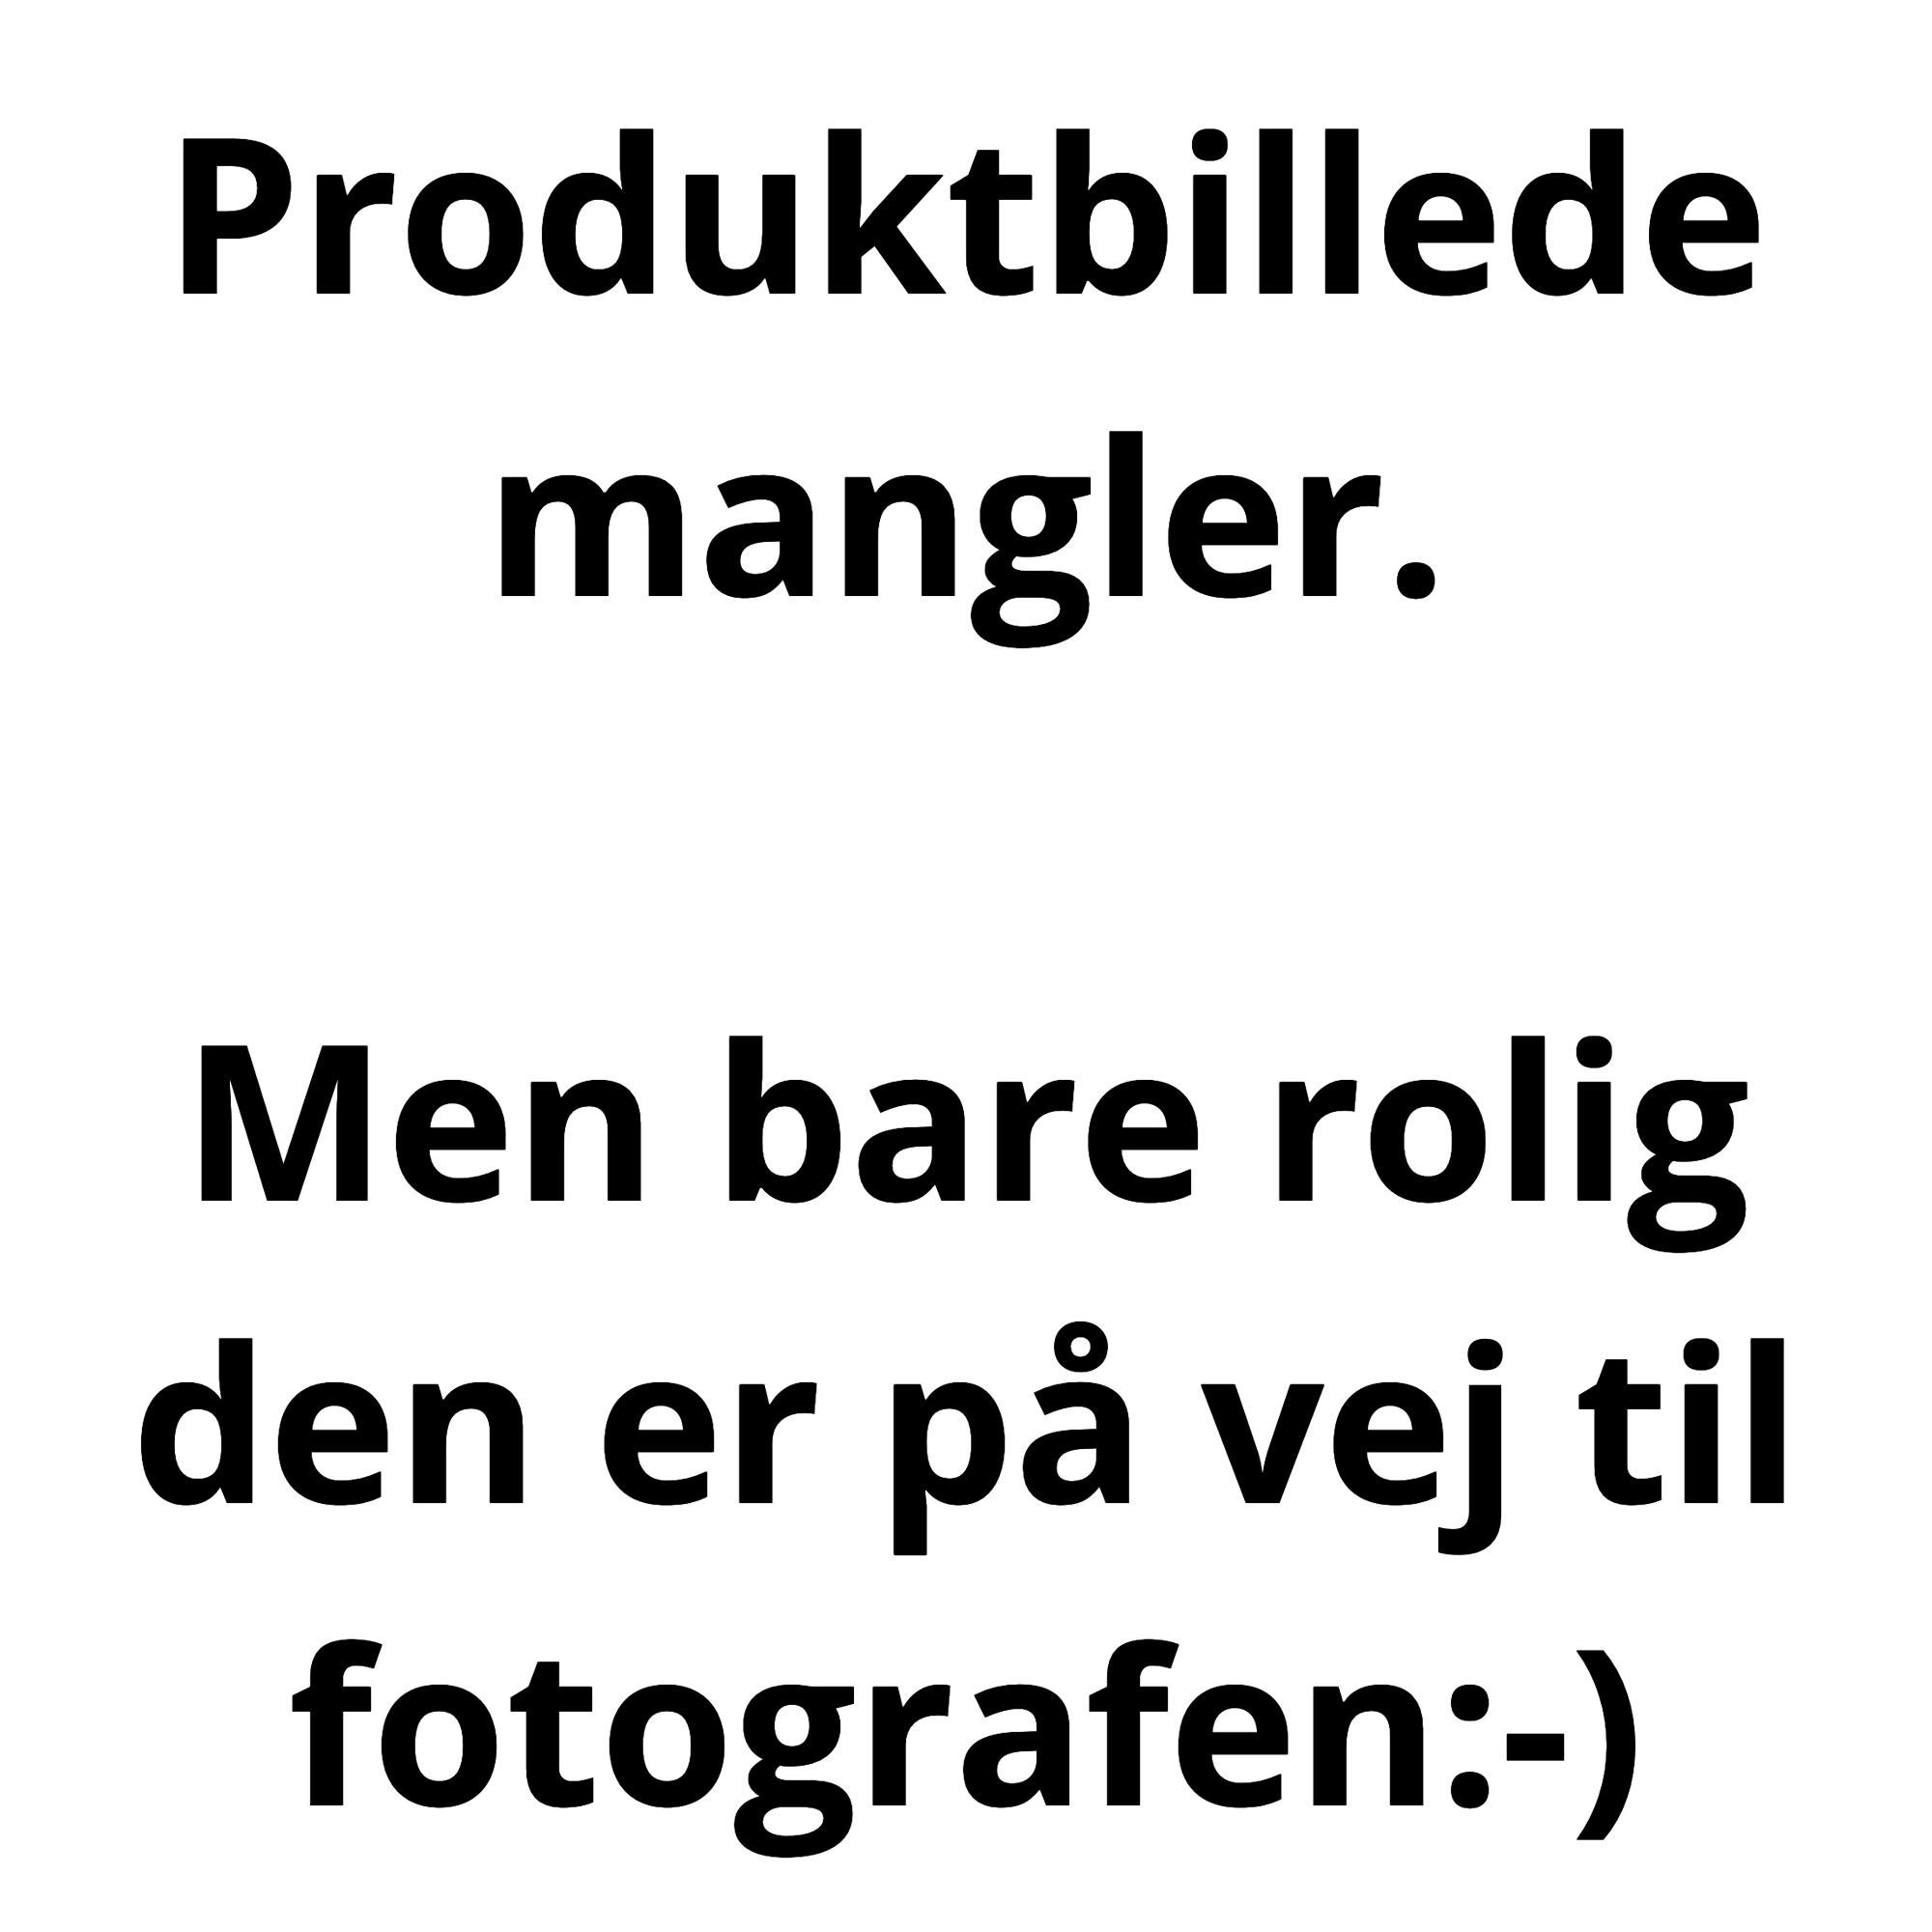 Brodit Apple iPhone 6/6S/7/8  med beskyttelsescover - Aktiv Holder